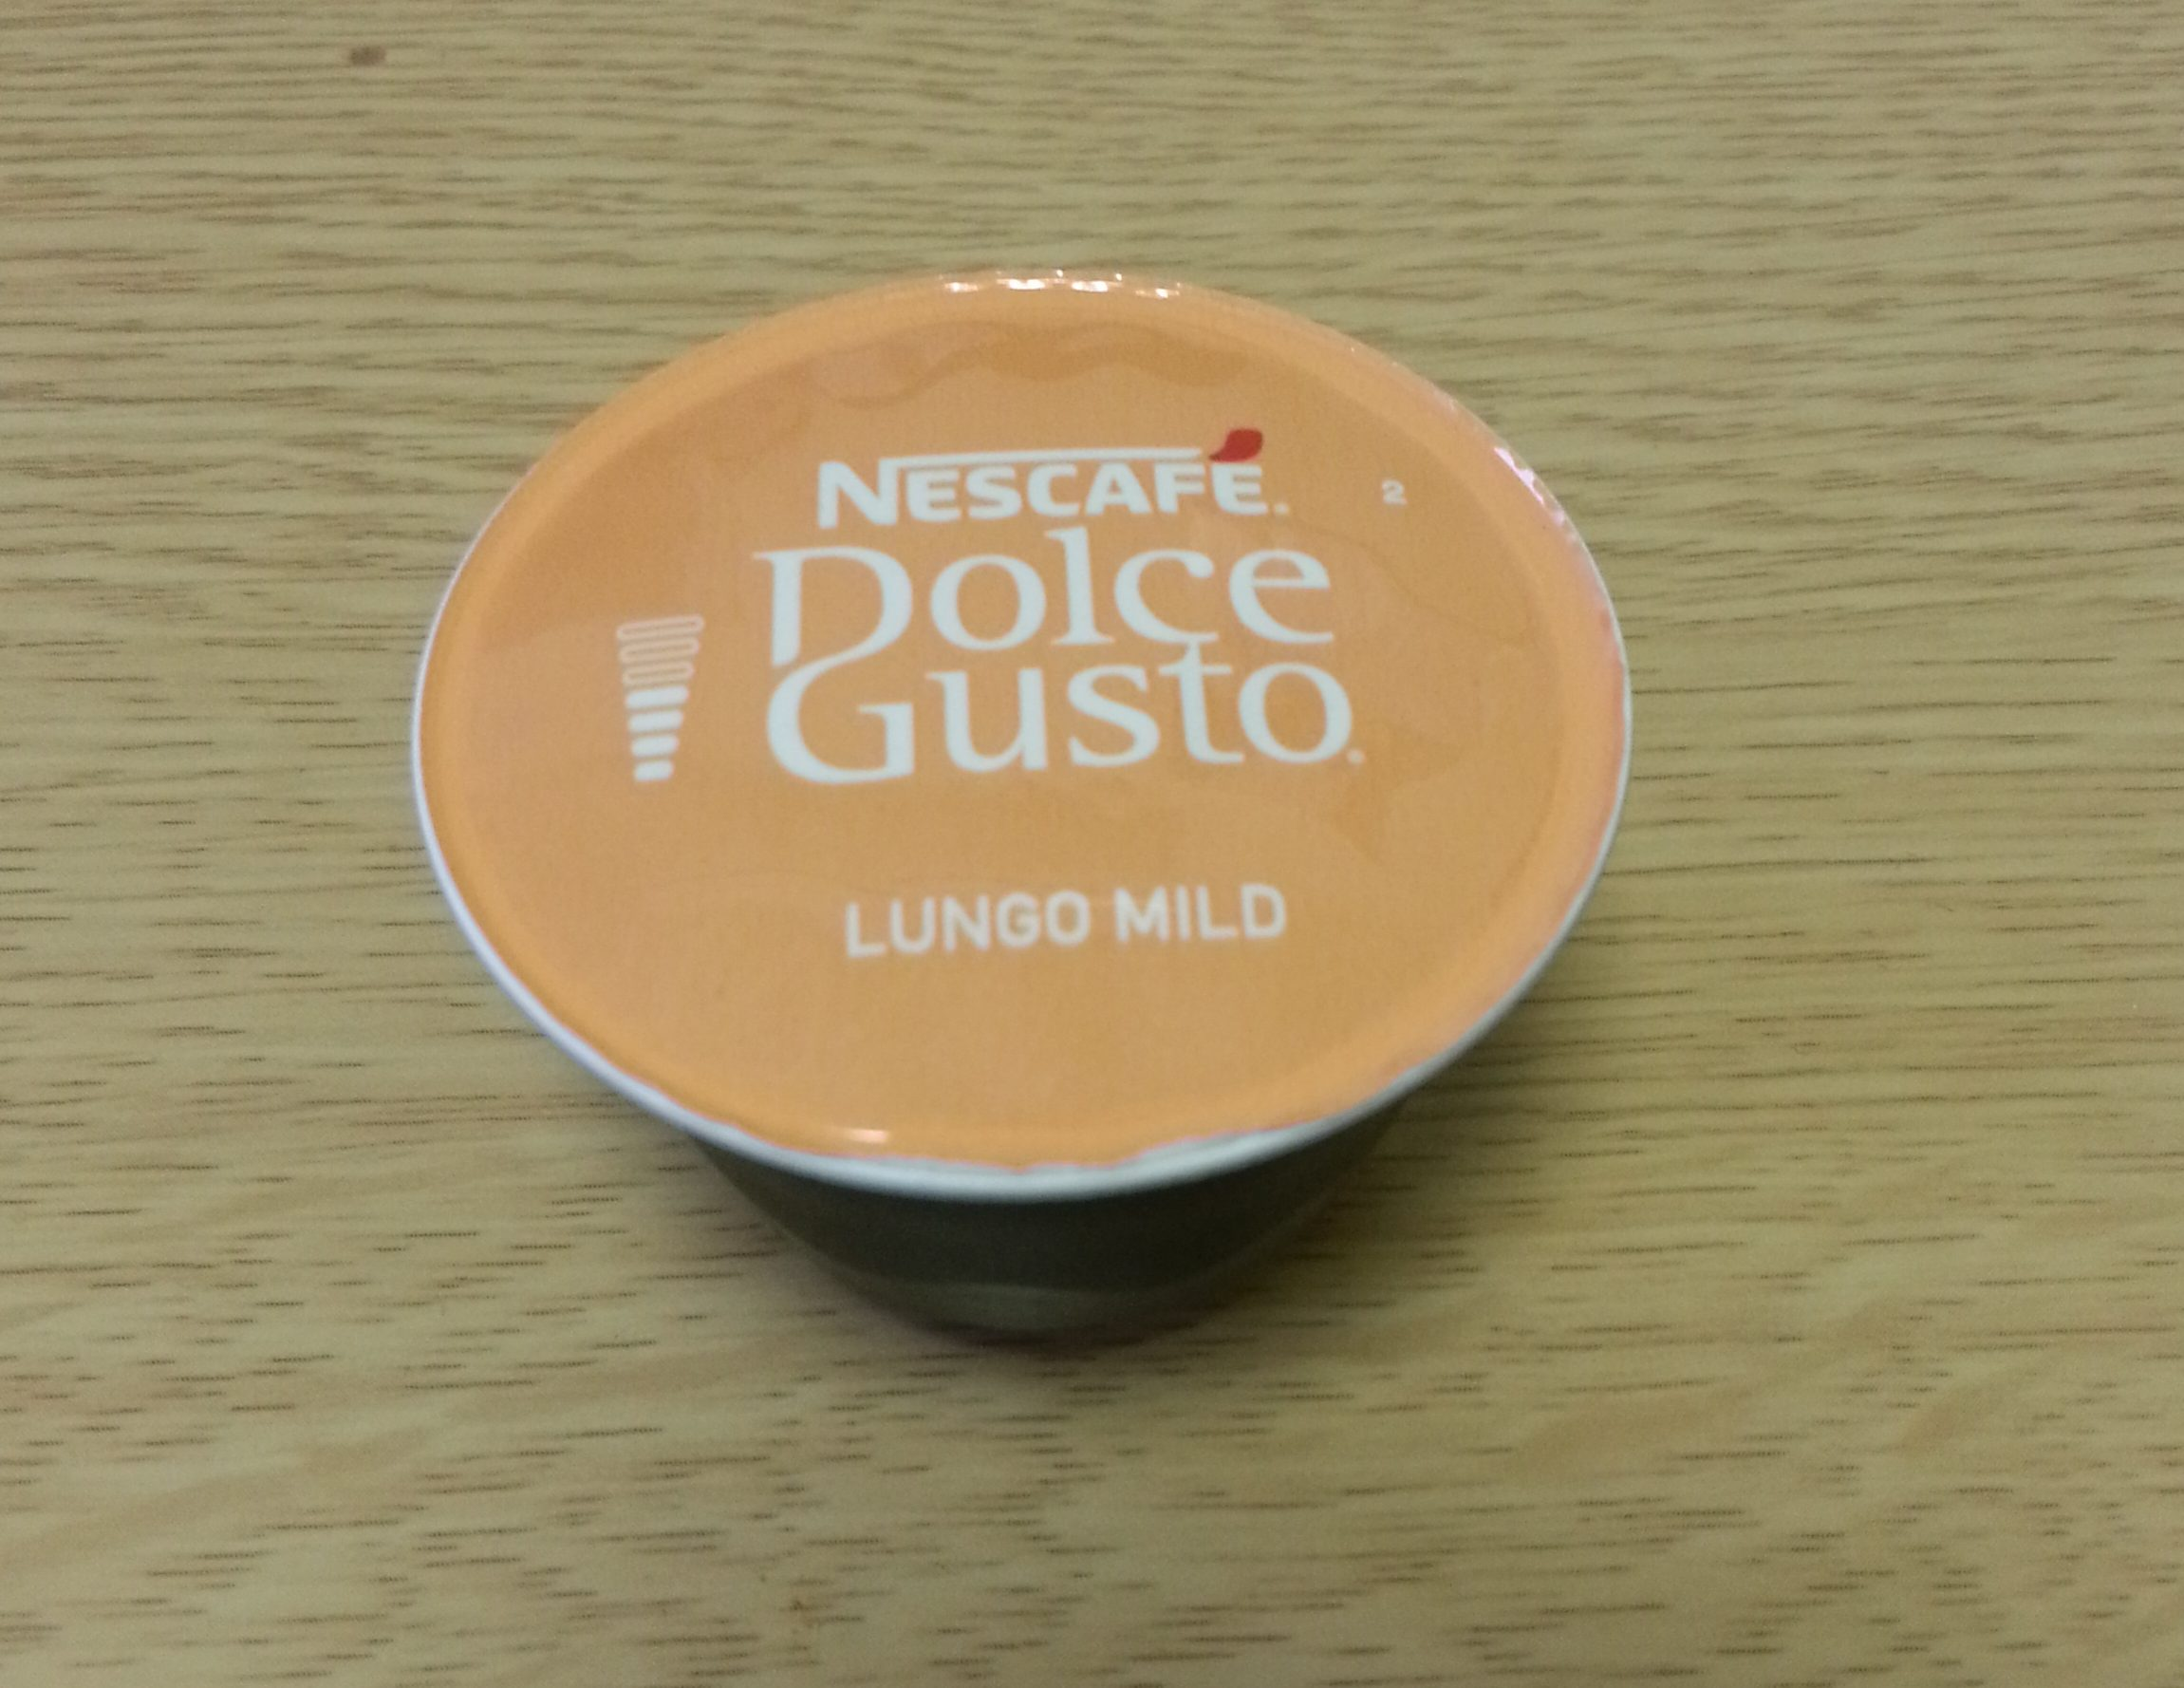 nescafe-dolcegusto-lungomild1